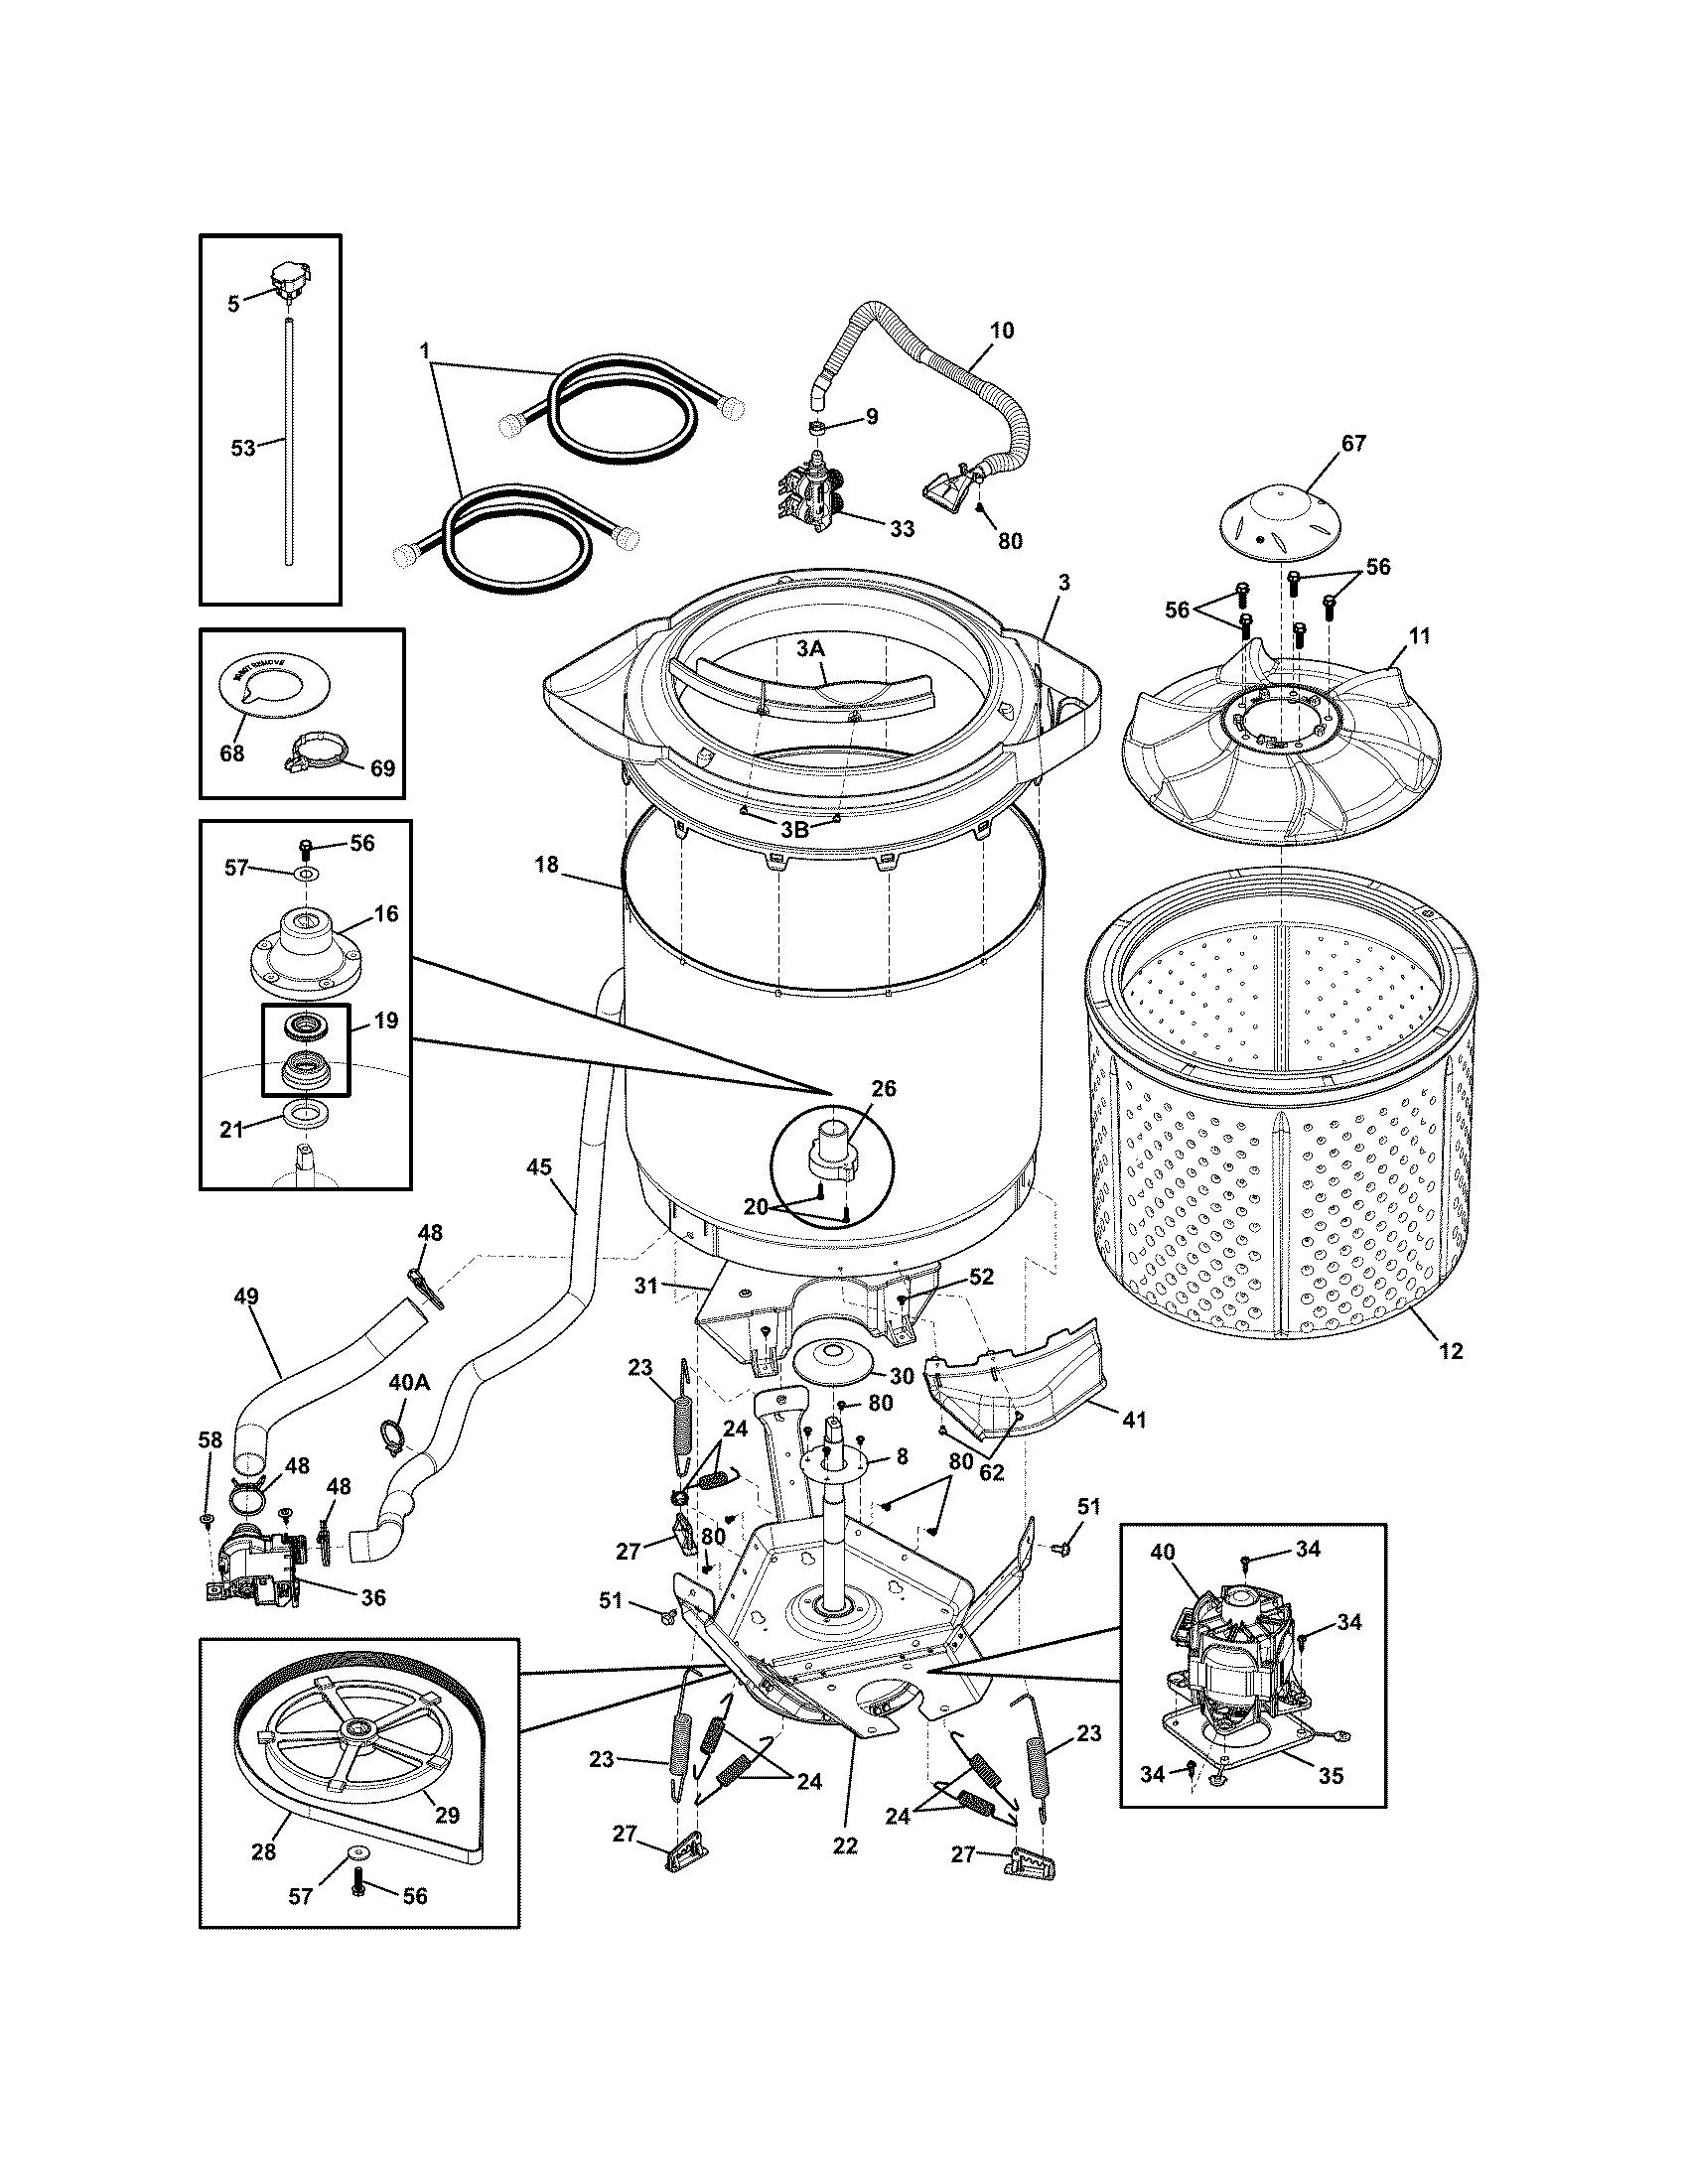 frigidaire dryer parts diagram